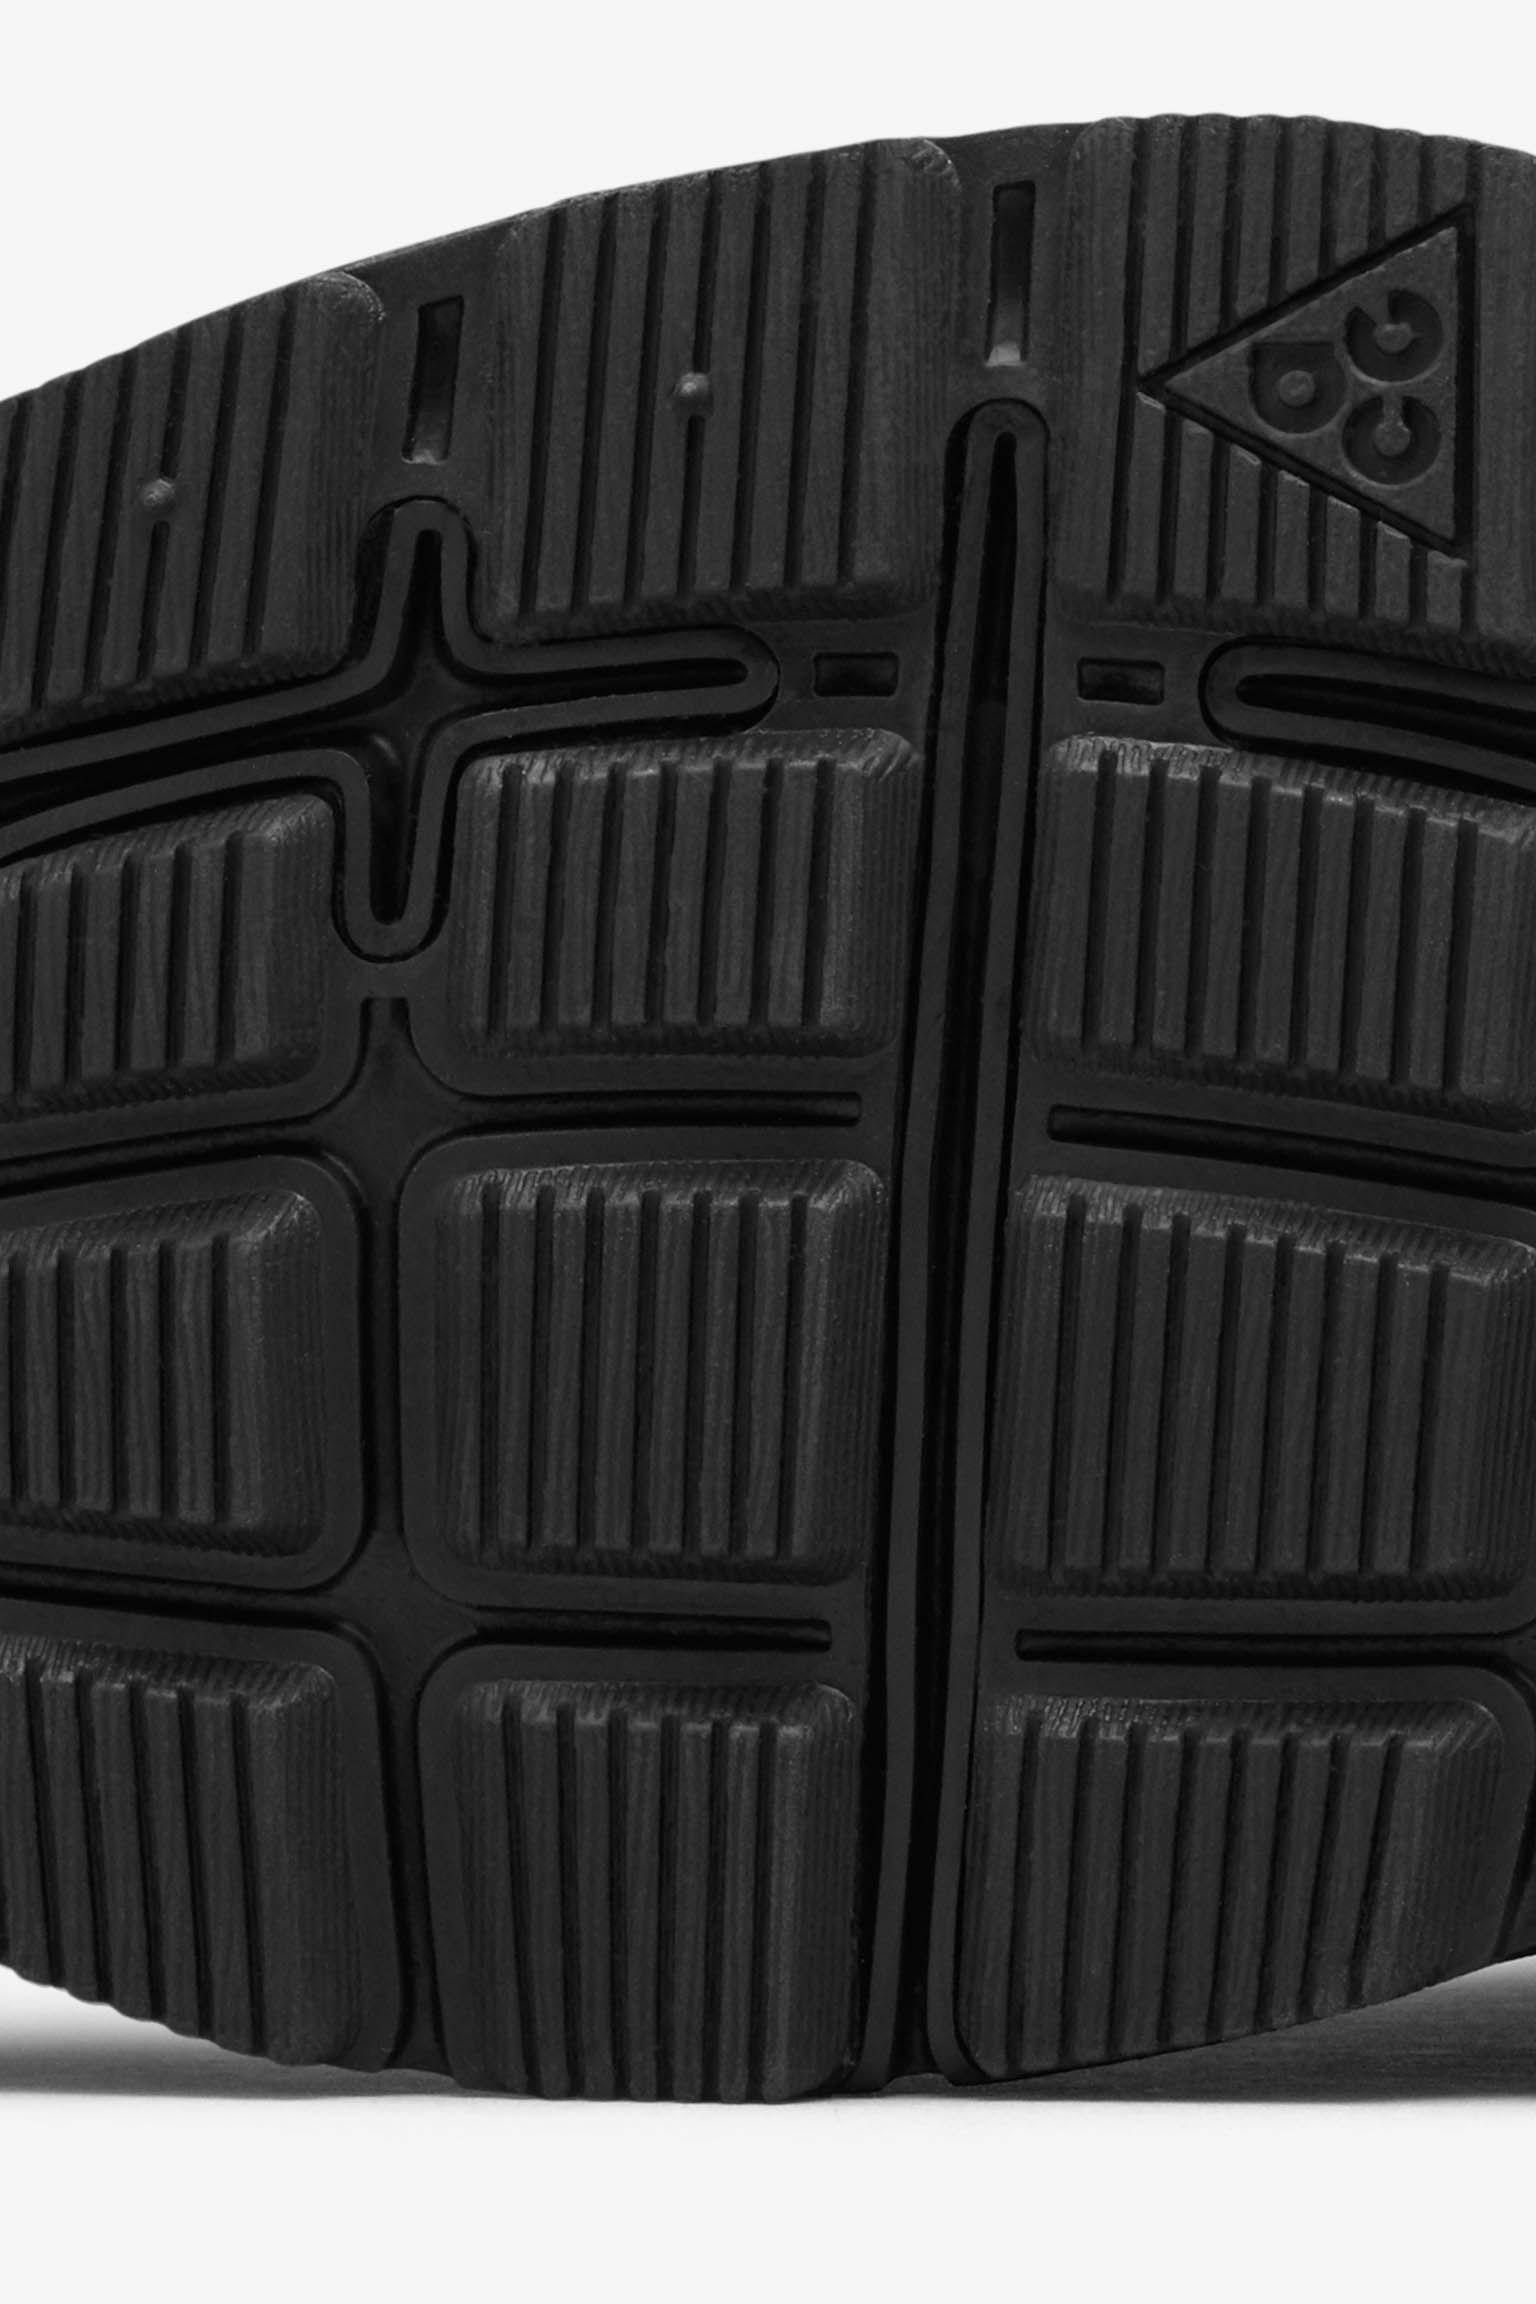 Women's Nike Acorra Sneakerboot 'Black & Reflect'